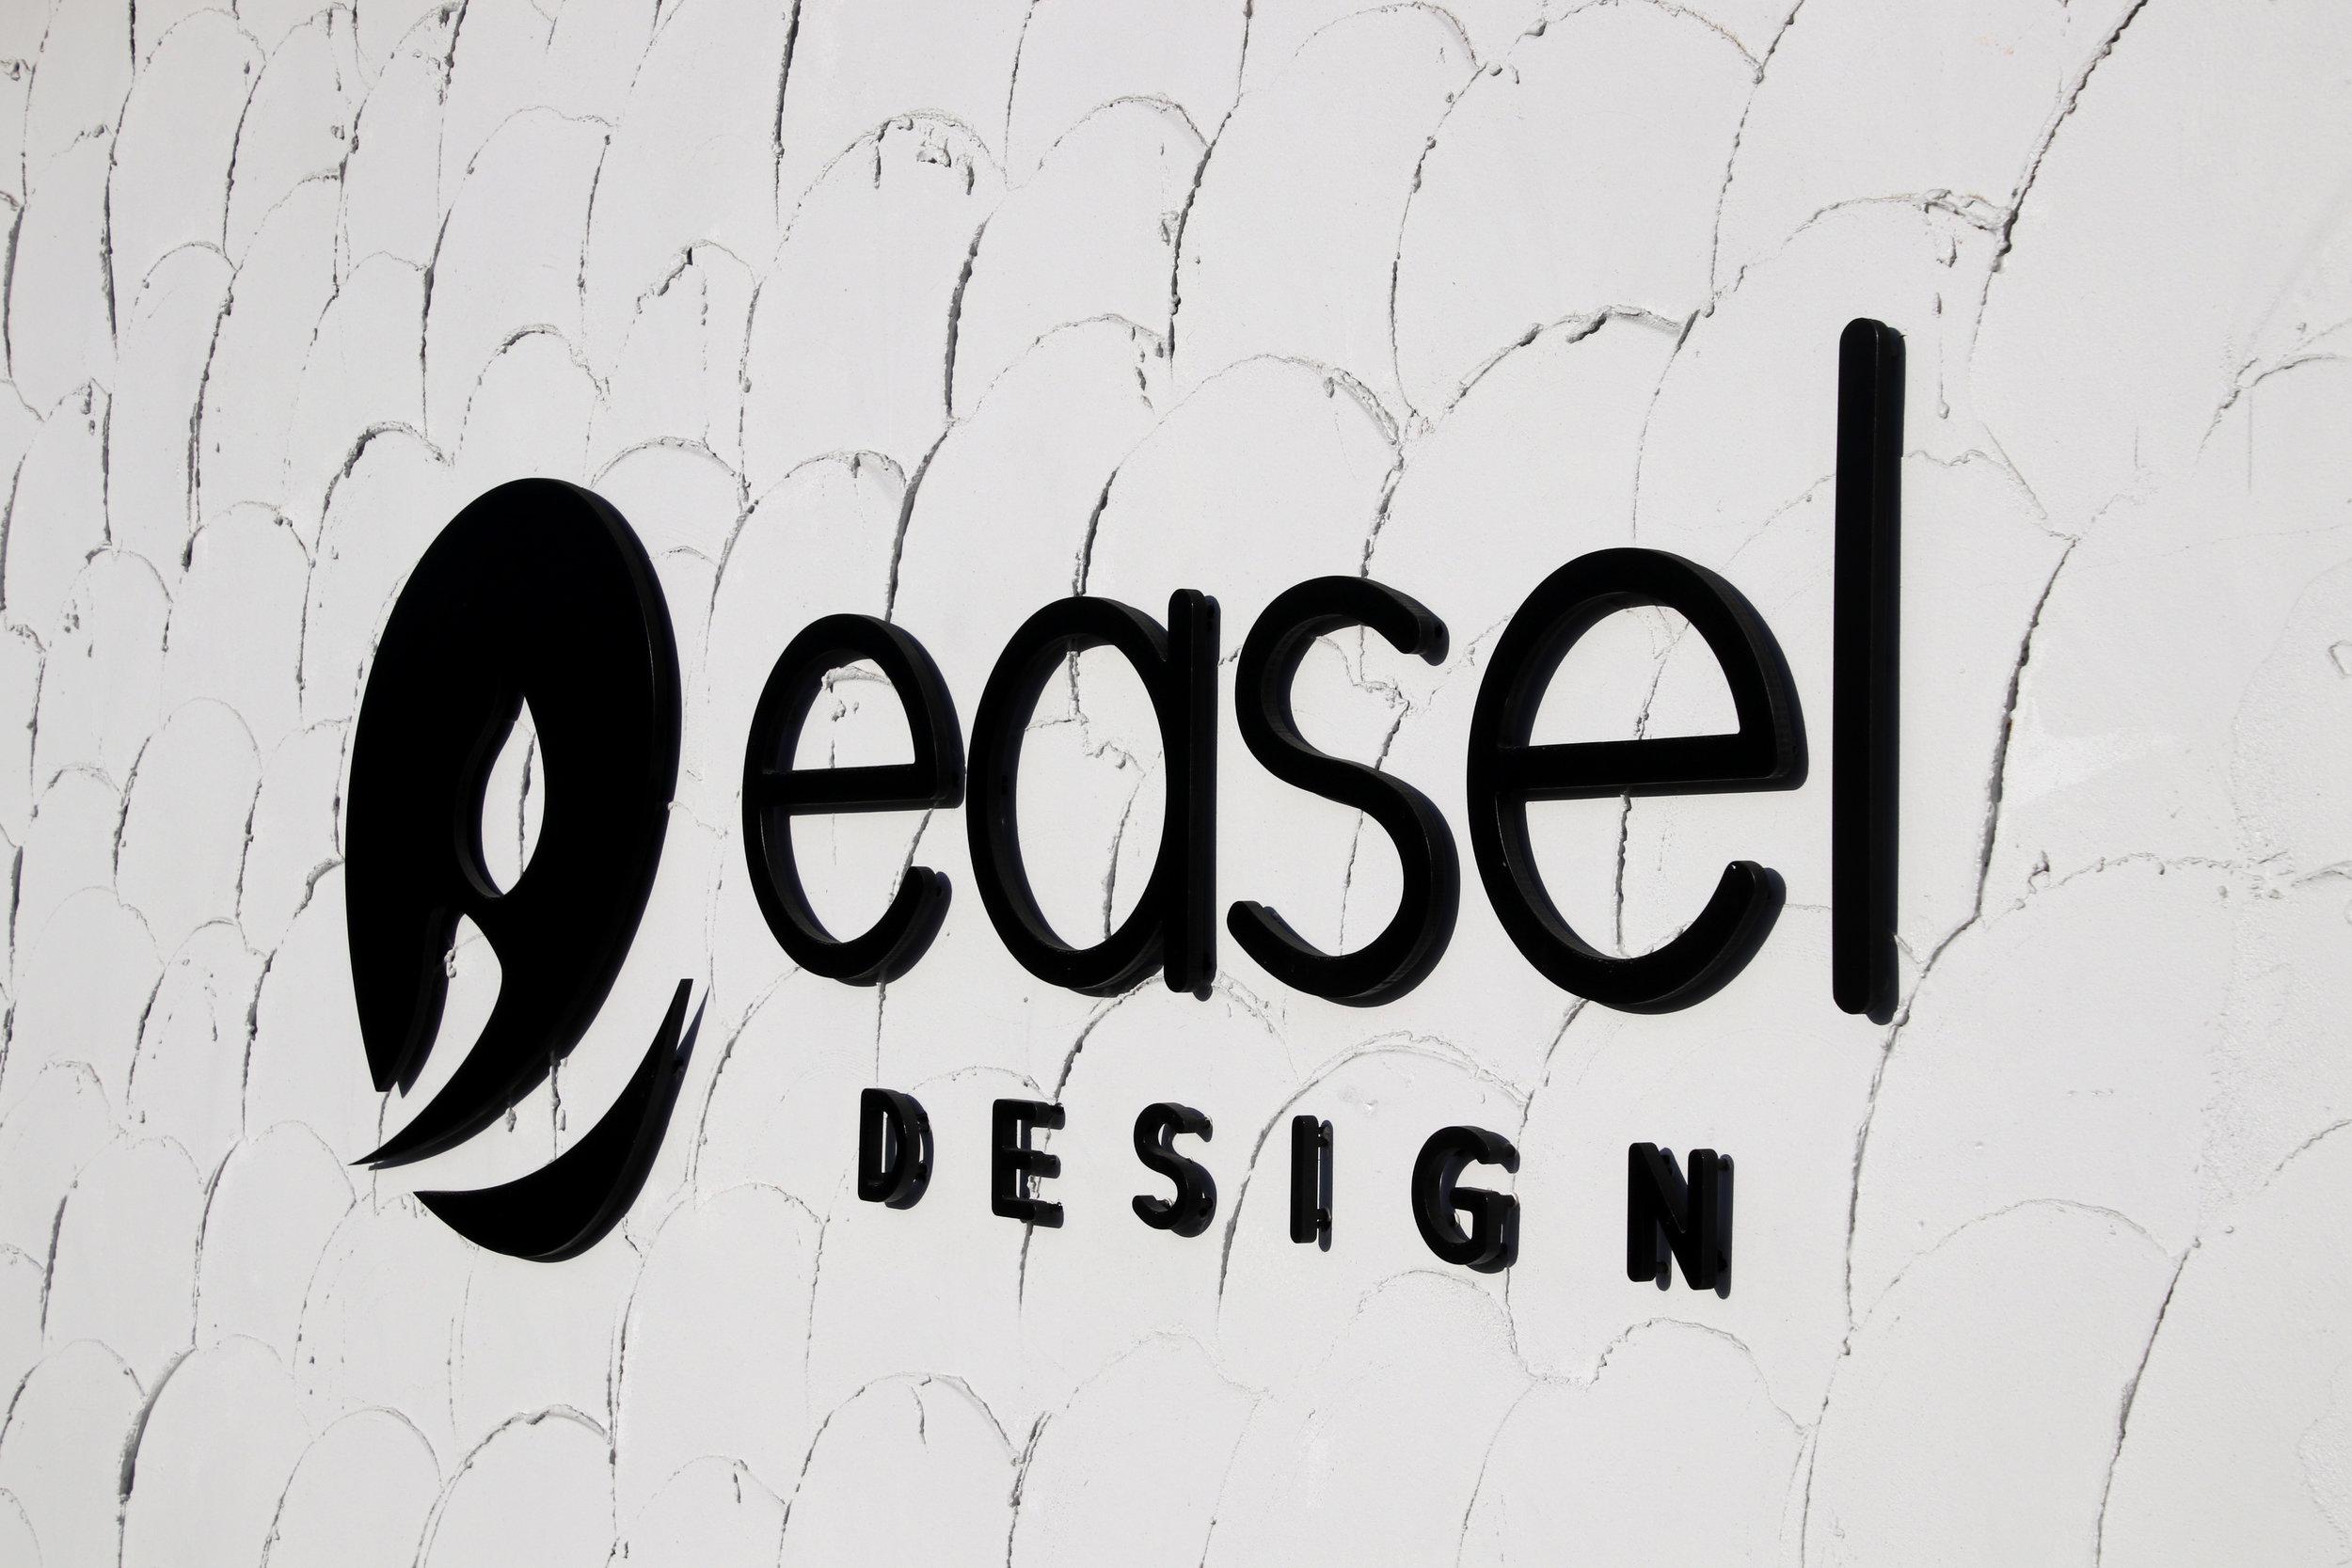 Easel_exterior_signage.jpg